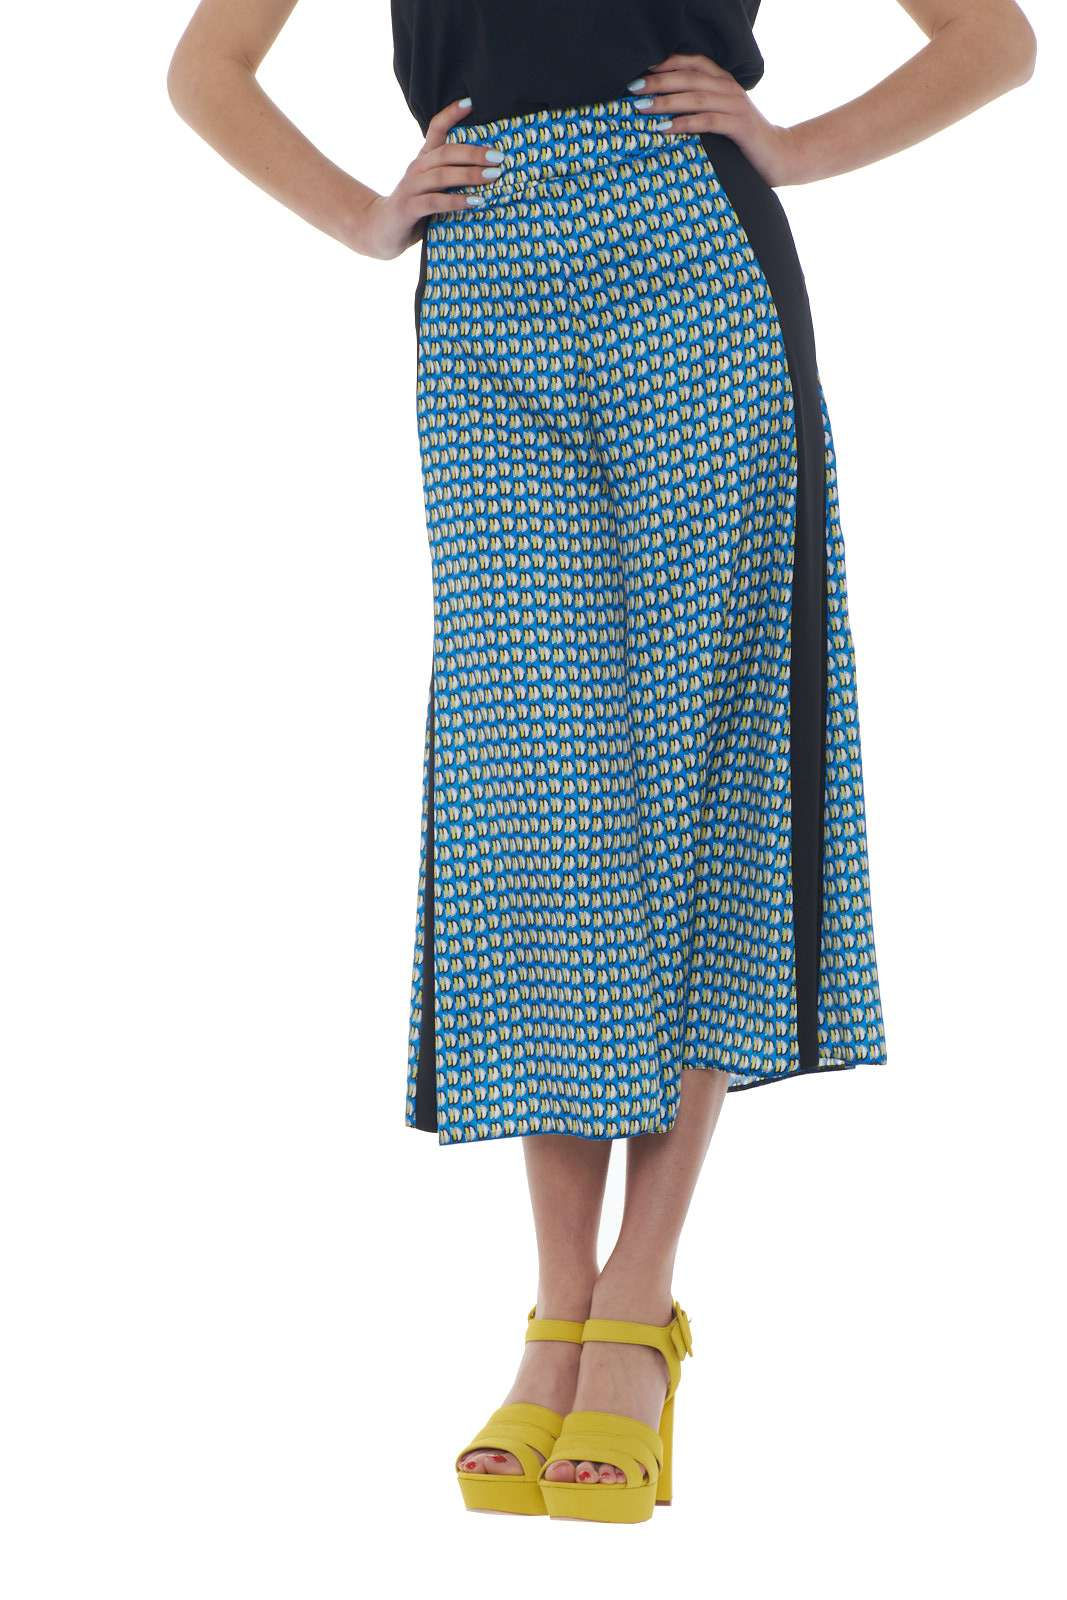 https://www.parmax.com/media/catalog/product/a/i/PE-outlet_parmax-pantaloni-donna-Mem-pa181t01-A.jpg